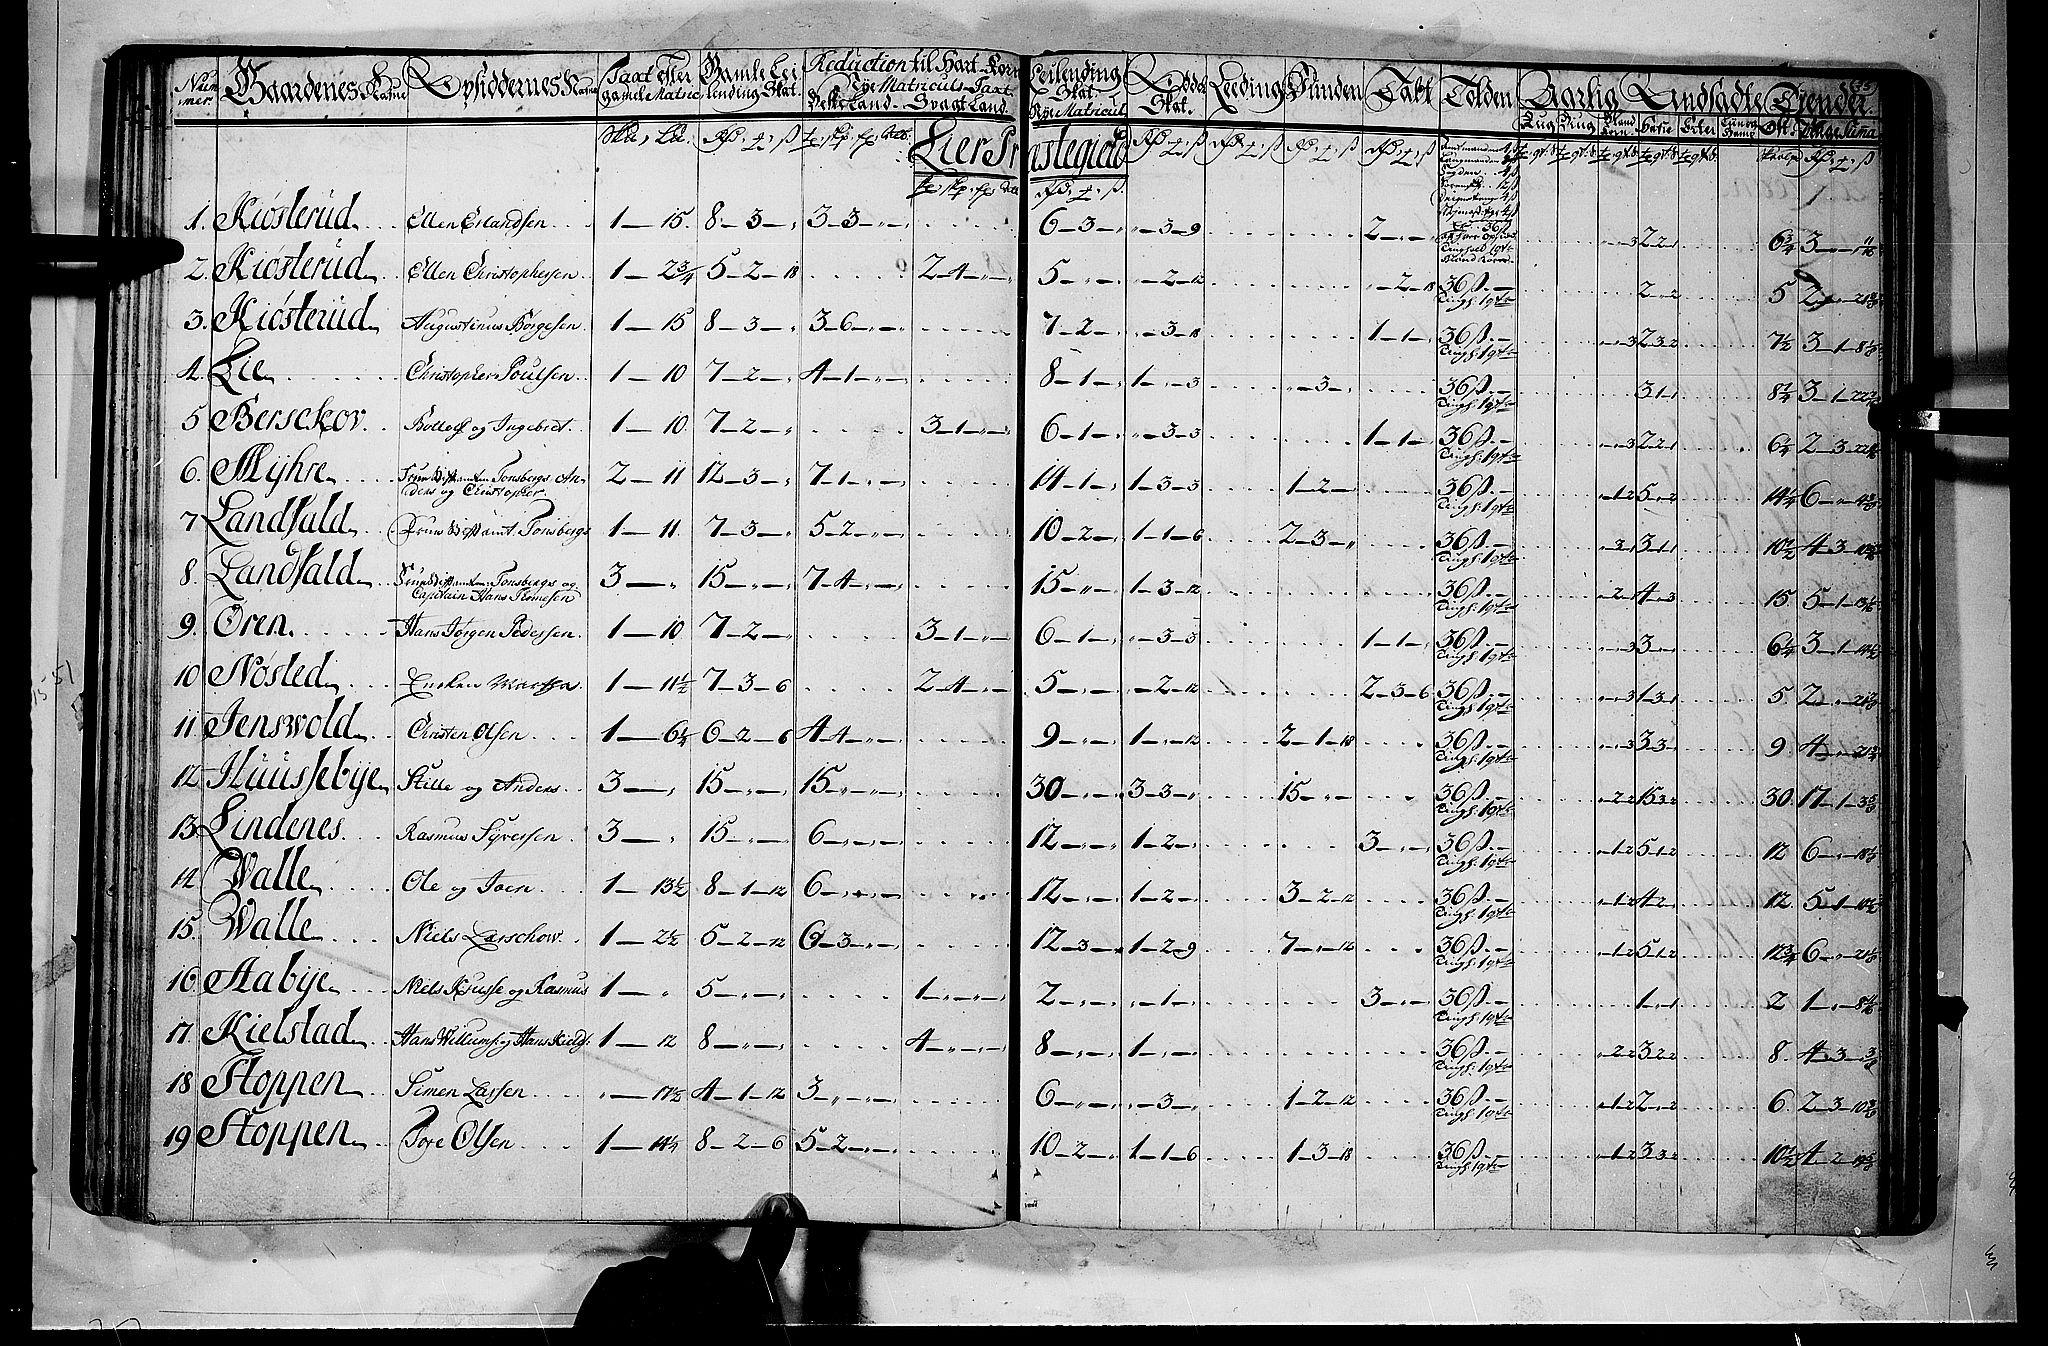 RA, Rentekammeret inntil 1814, Realistisk ordnet avdeling, N/Nb/Nbf/L0112: Buskerud matrikkelprotokoll, 1723, s. 34b-35a